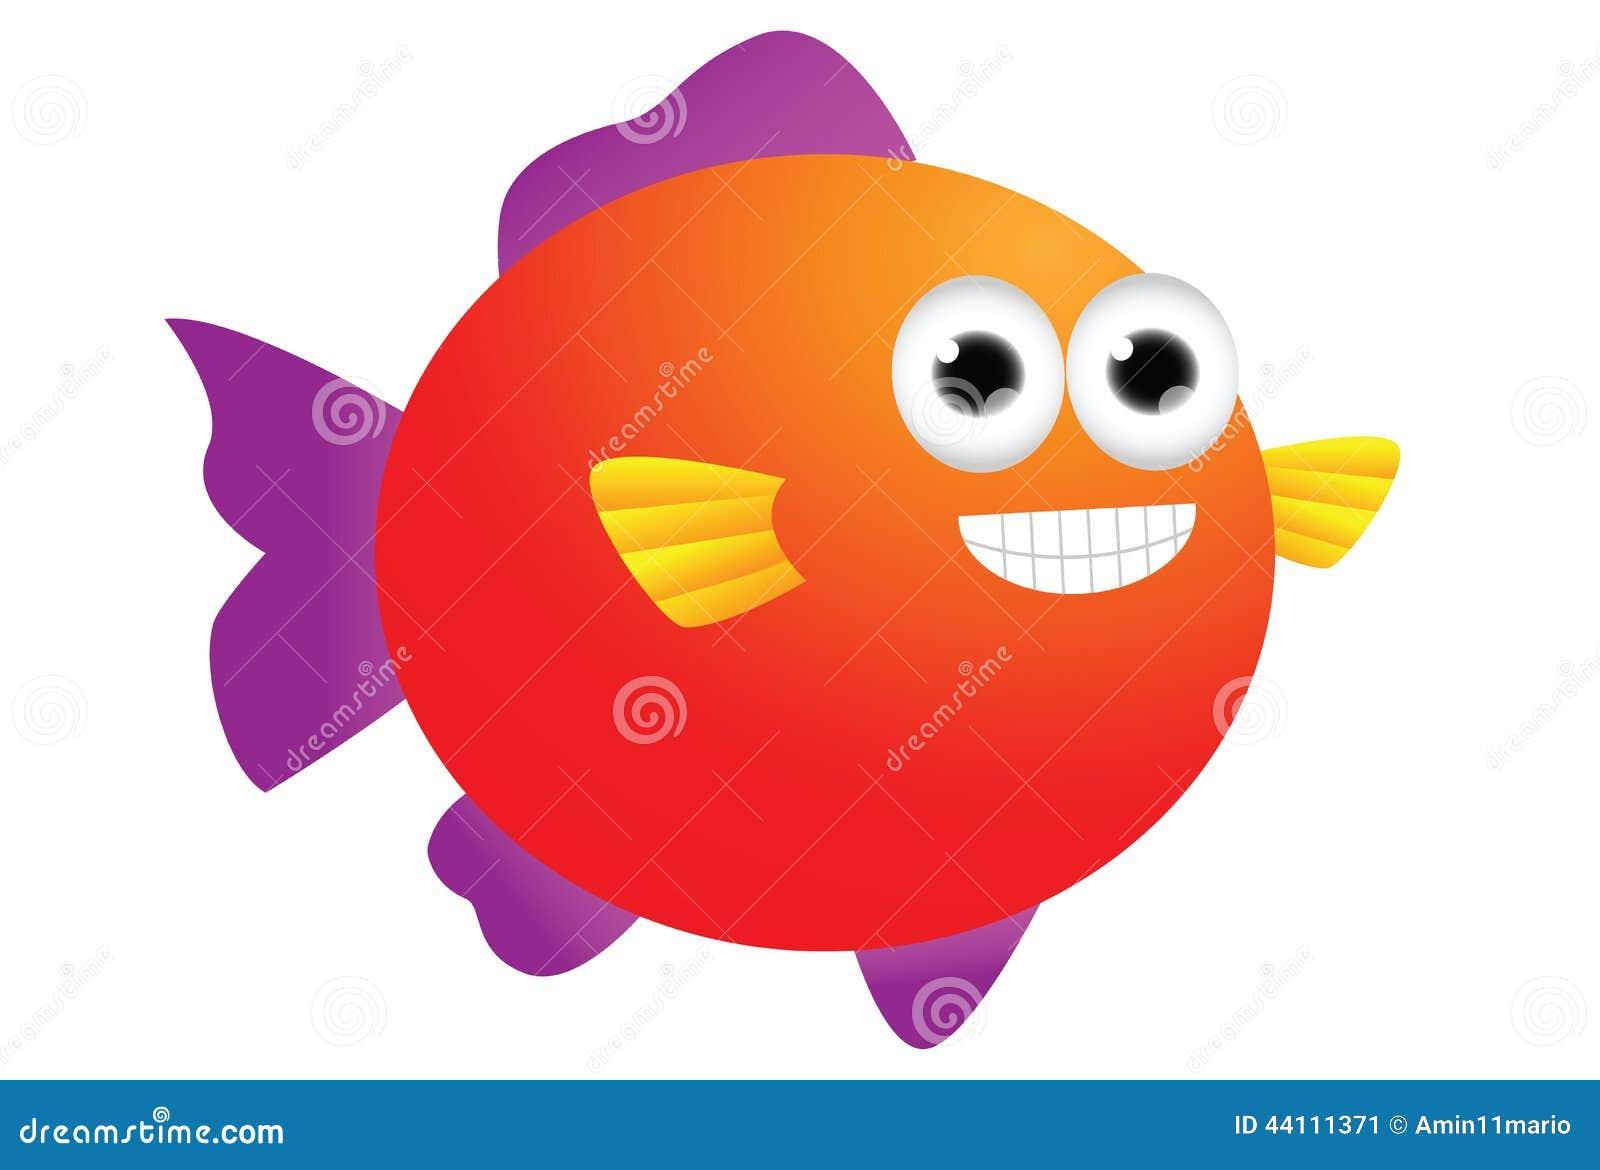 Cute puffer fish cartoon stock illustration. Illustration of cartoon ...